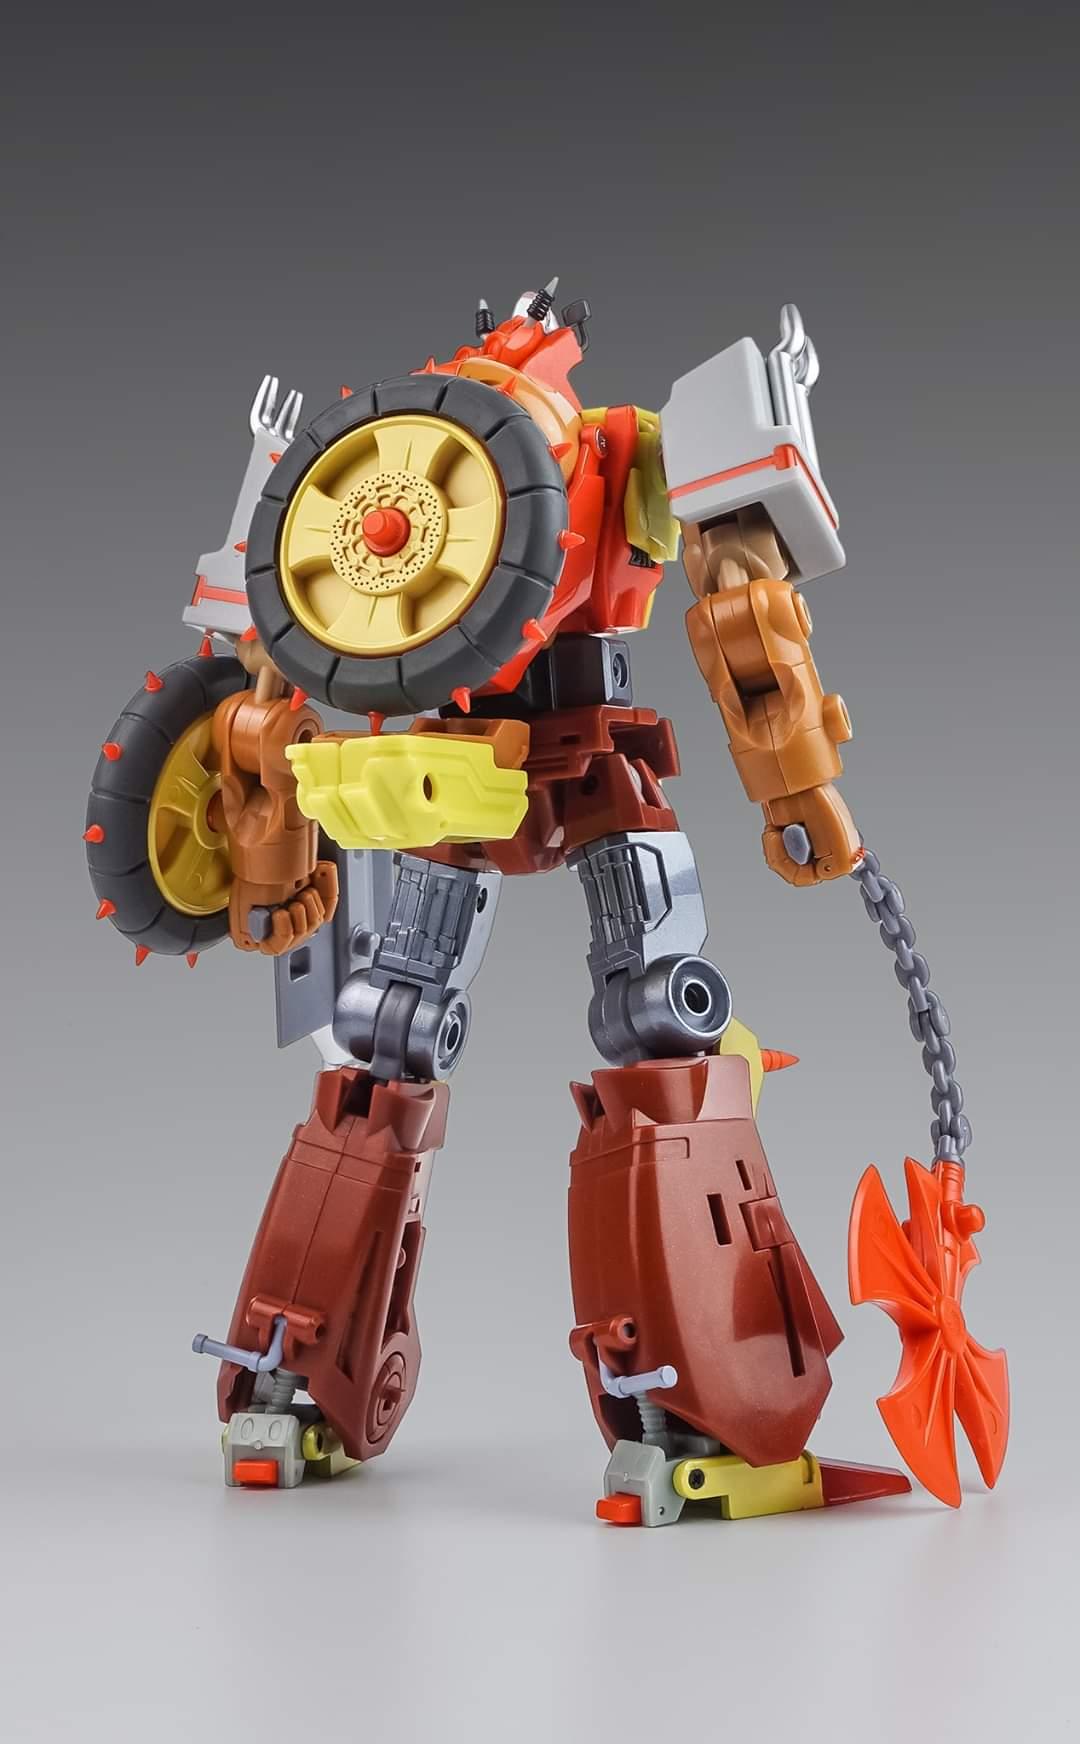 [KFC Toys] Produit Tiers - Jouets Crash Hog (aka Wreck-gar/Ferraille), Dumpyard (aka Junkyard/Décharge) et autres Junkions/Ferrailleurs - Page 3 ZrrEW2JE_o